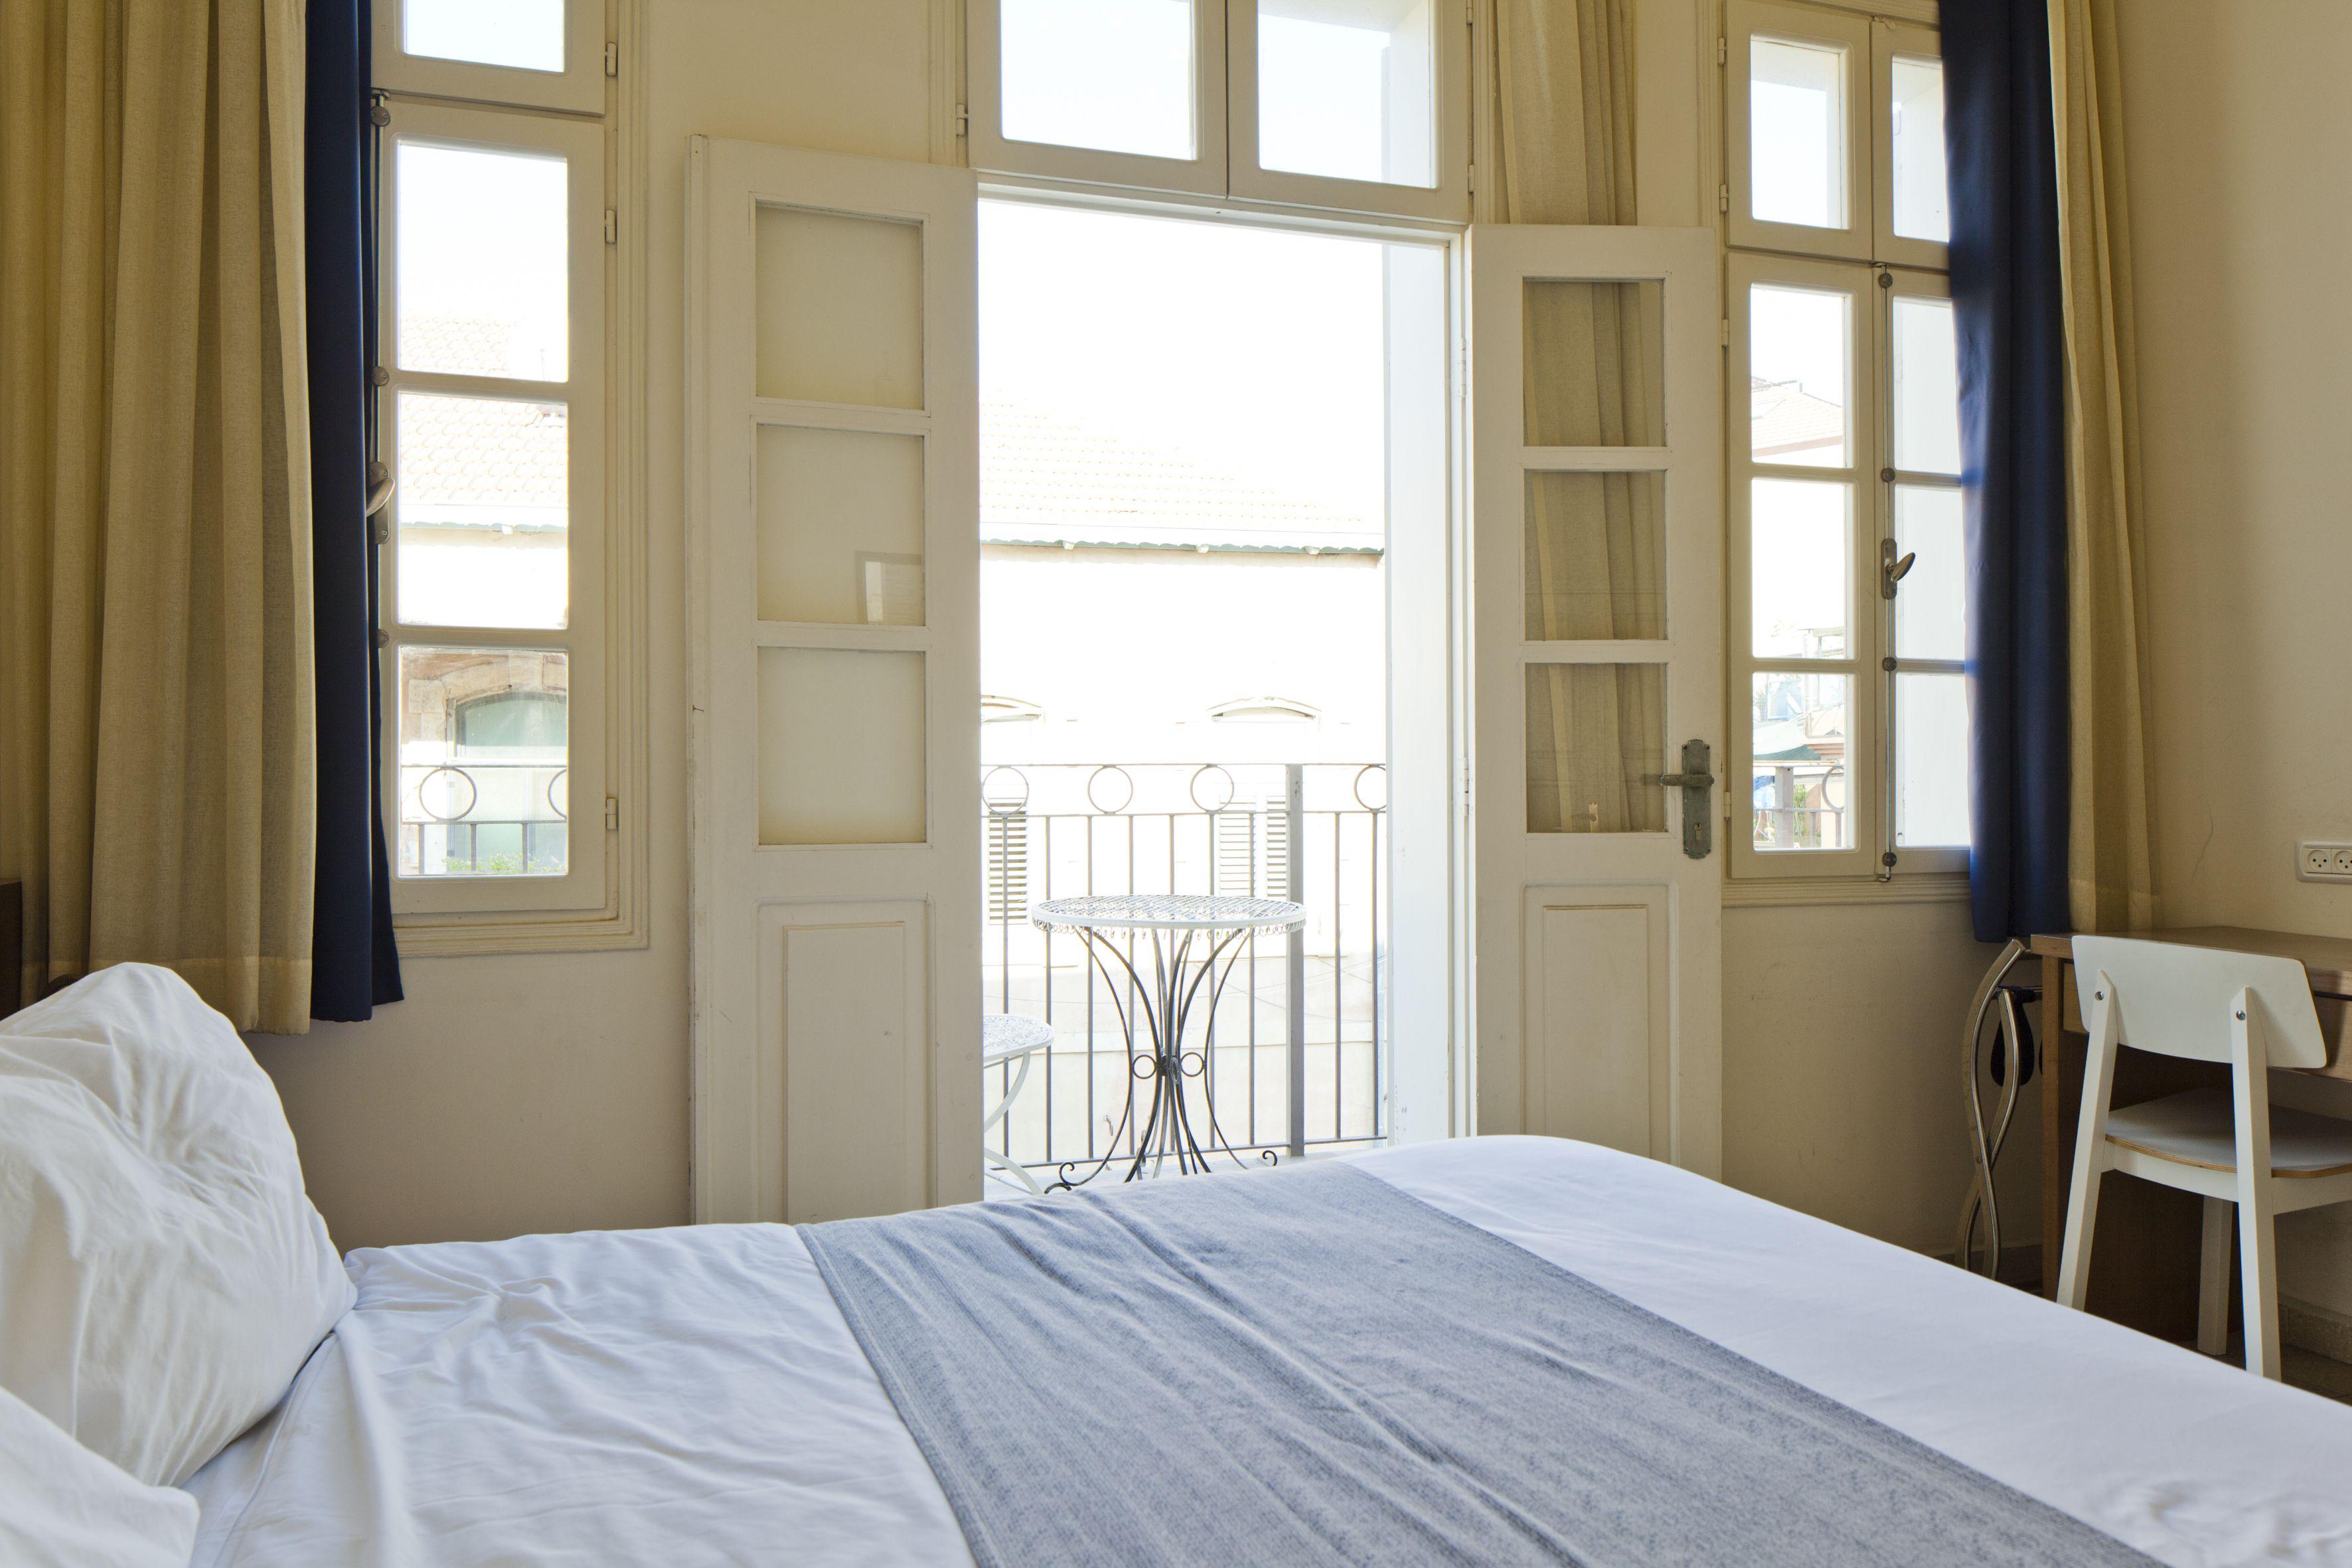 The Clock - Tel Aviv Jaffa Luxury Suites